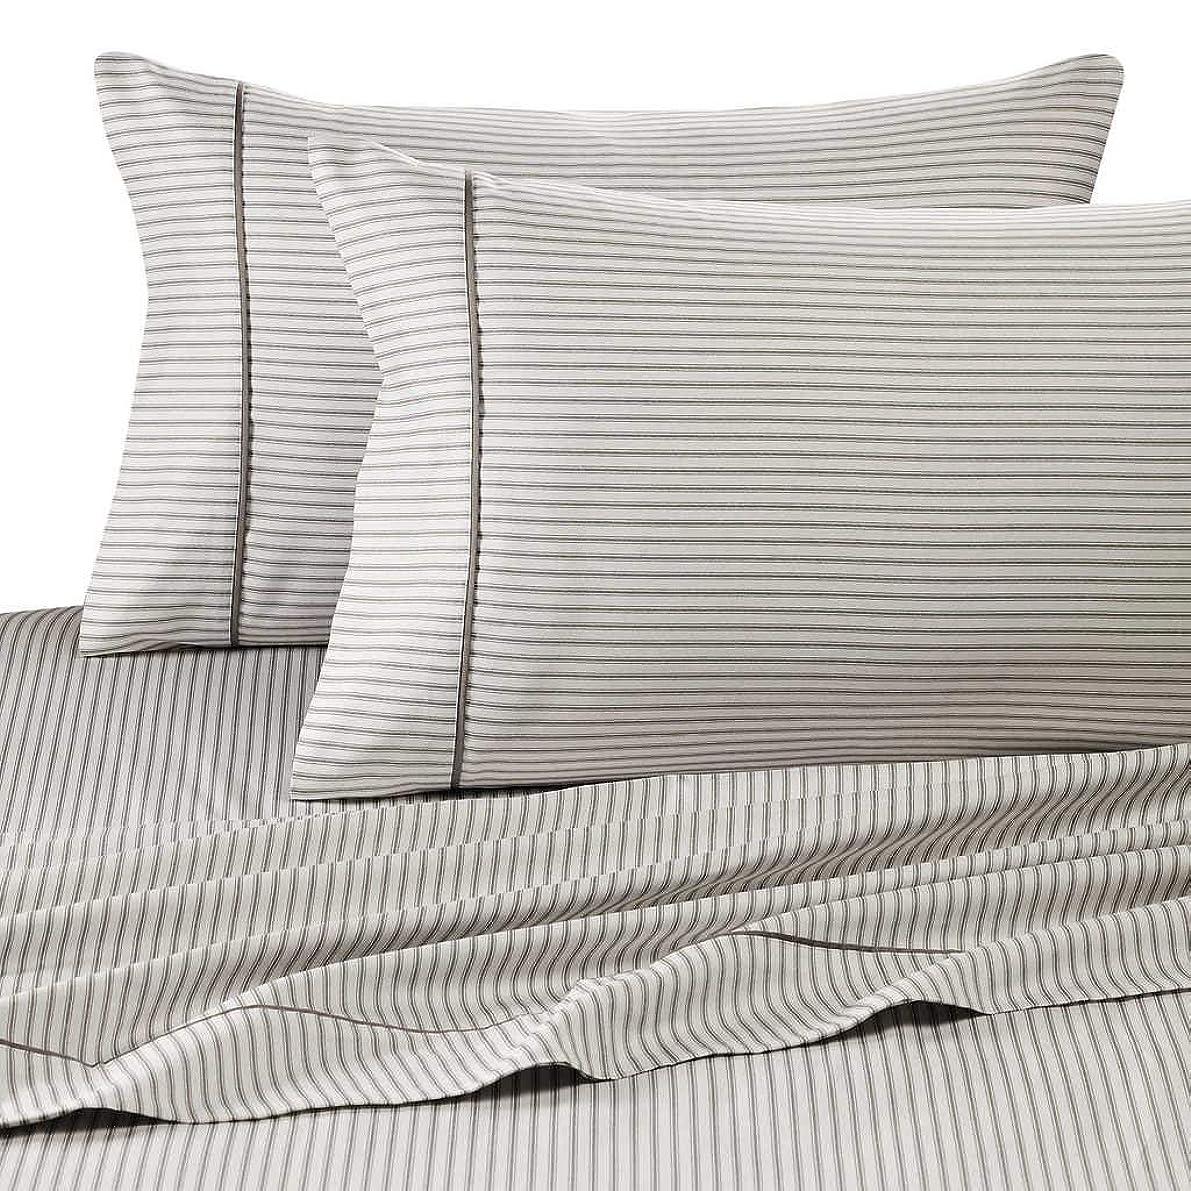 Rajlinen King Size Sheet SET-100% Cotton- 400 Thread Count- 15